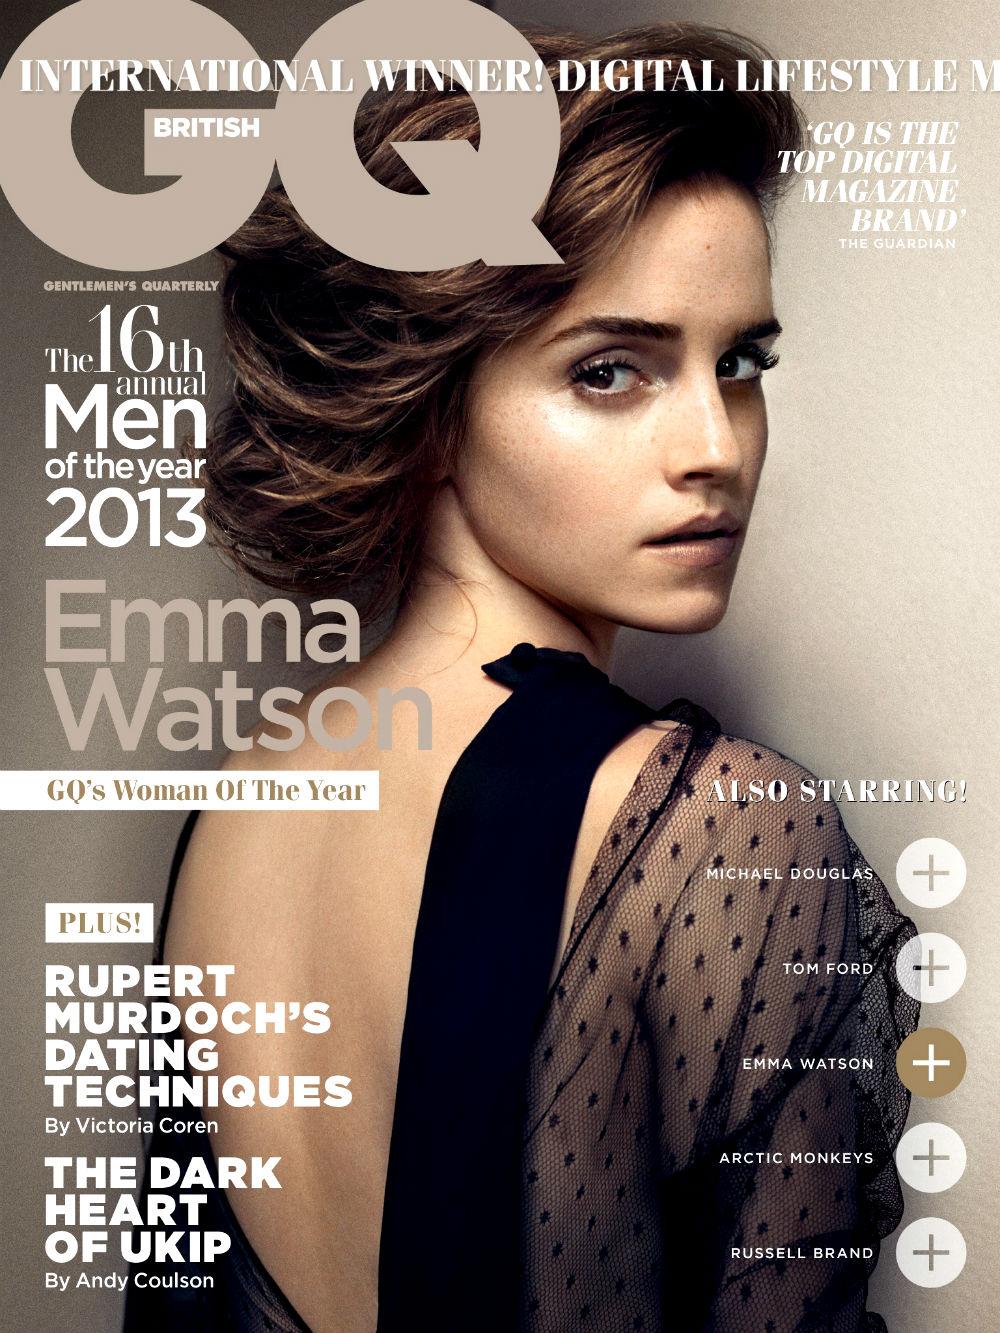 https://lh3.ggpht.com/-zk7alJTFUXg/UioRpm83KSI/AAAAAAAAAIA/45vNLH9s-wY/s1600/Emma-Watson-GQ-UK-October-2013-Photoshoot.jpg